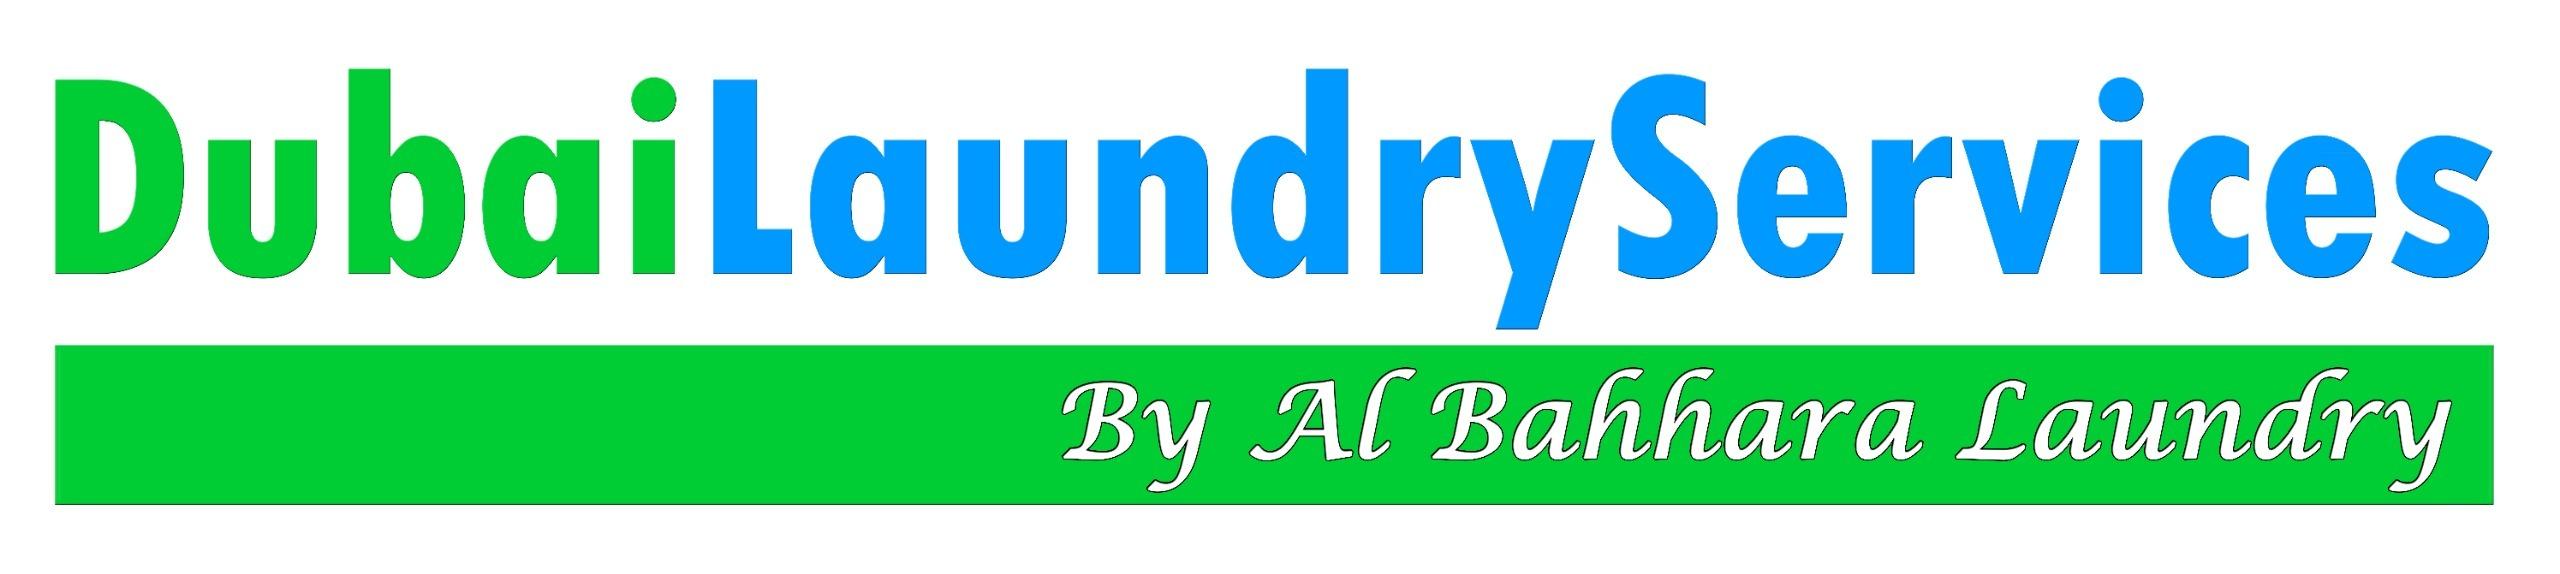 Dubai Laundry Services by Al Bahhara Laundry (@dubailaundryservices) Cover Image